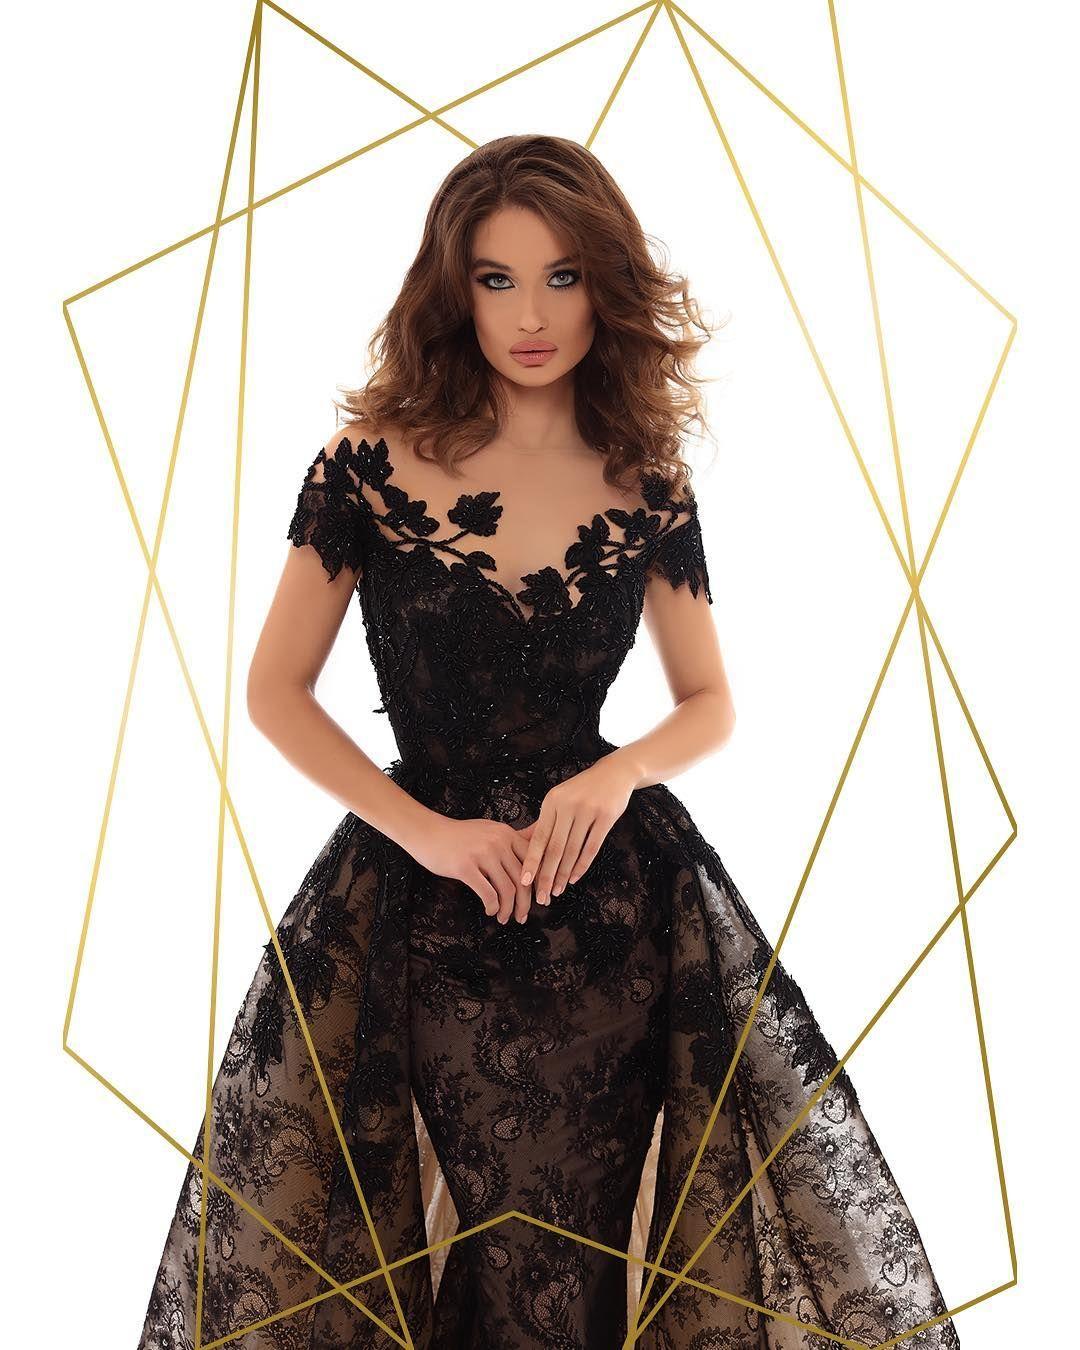 Tarik Ediz On Instagram Get Two Dresses In One With This Glamorous Black Gown Dress Code Romeo Juliet 93627 Tarikediz Tarikedizevening Eveningdre [ 1350 x 1080 Pixel ]